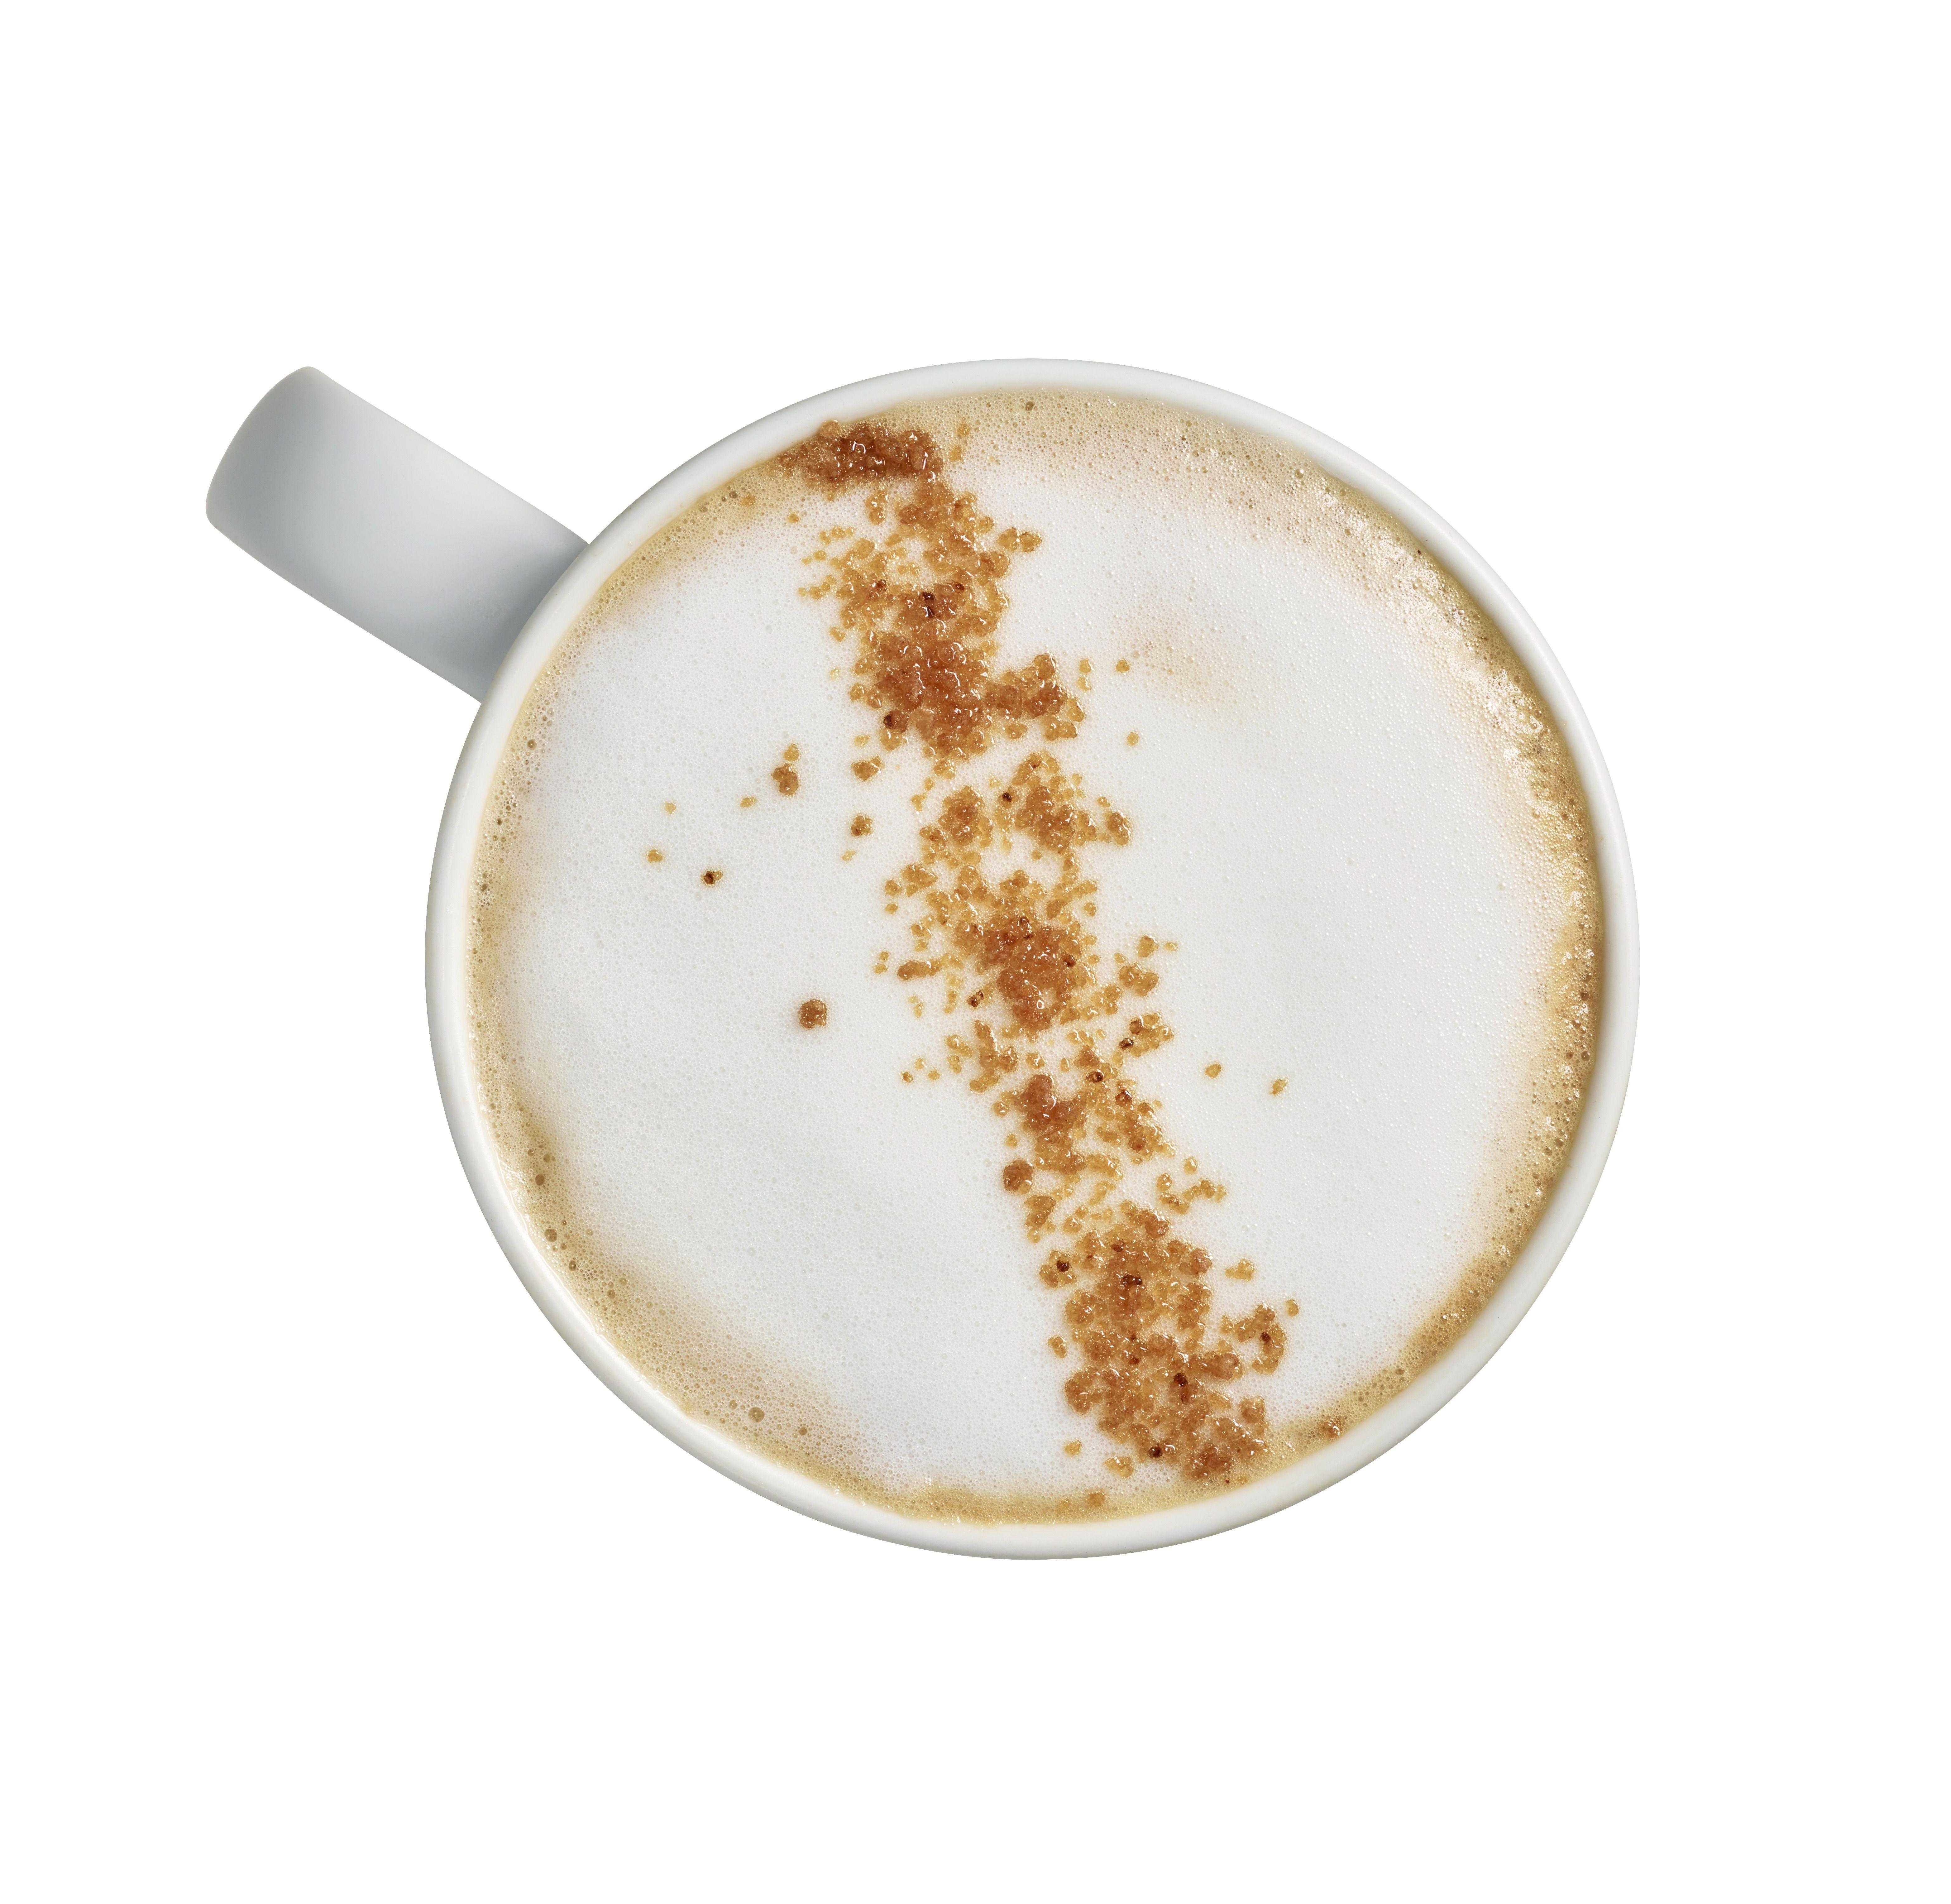 Starbucks Will Release A Brand New Latte Flavor In 2017 - Starbucks ...